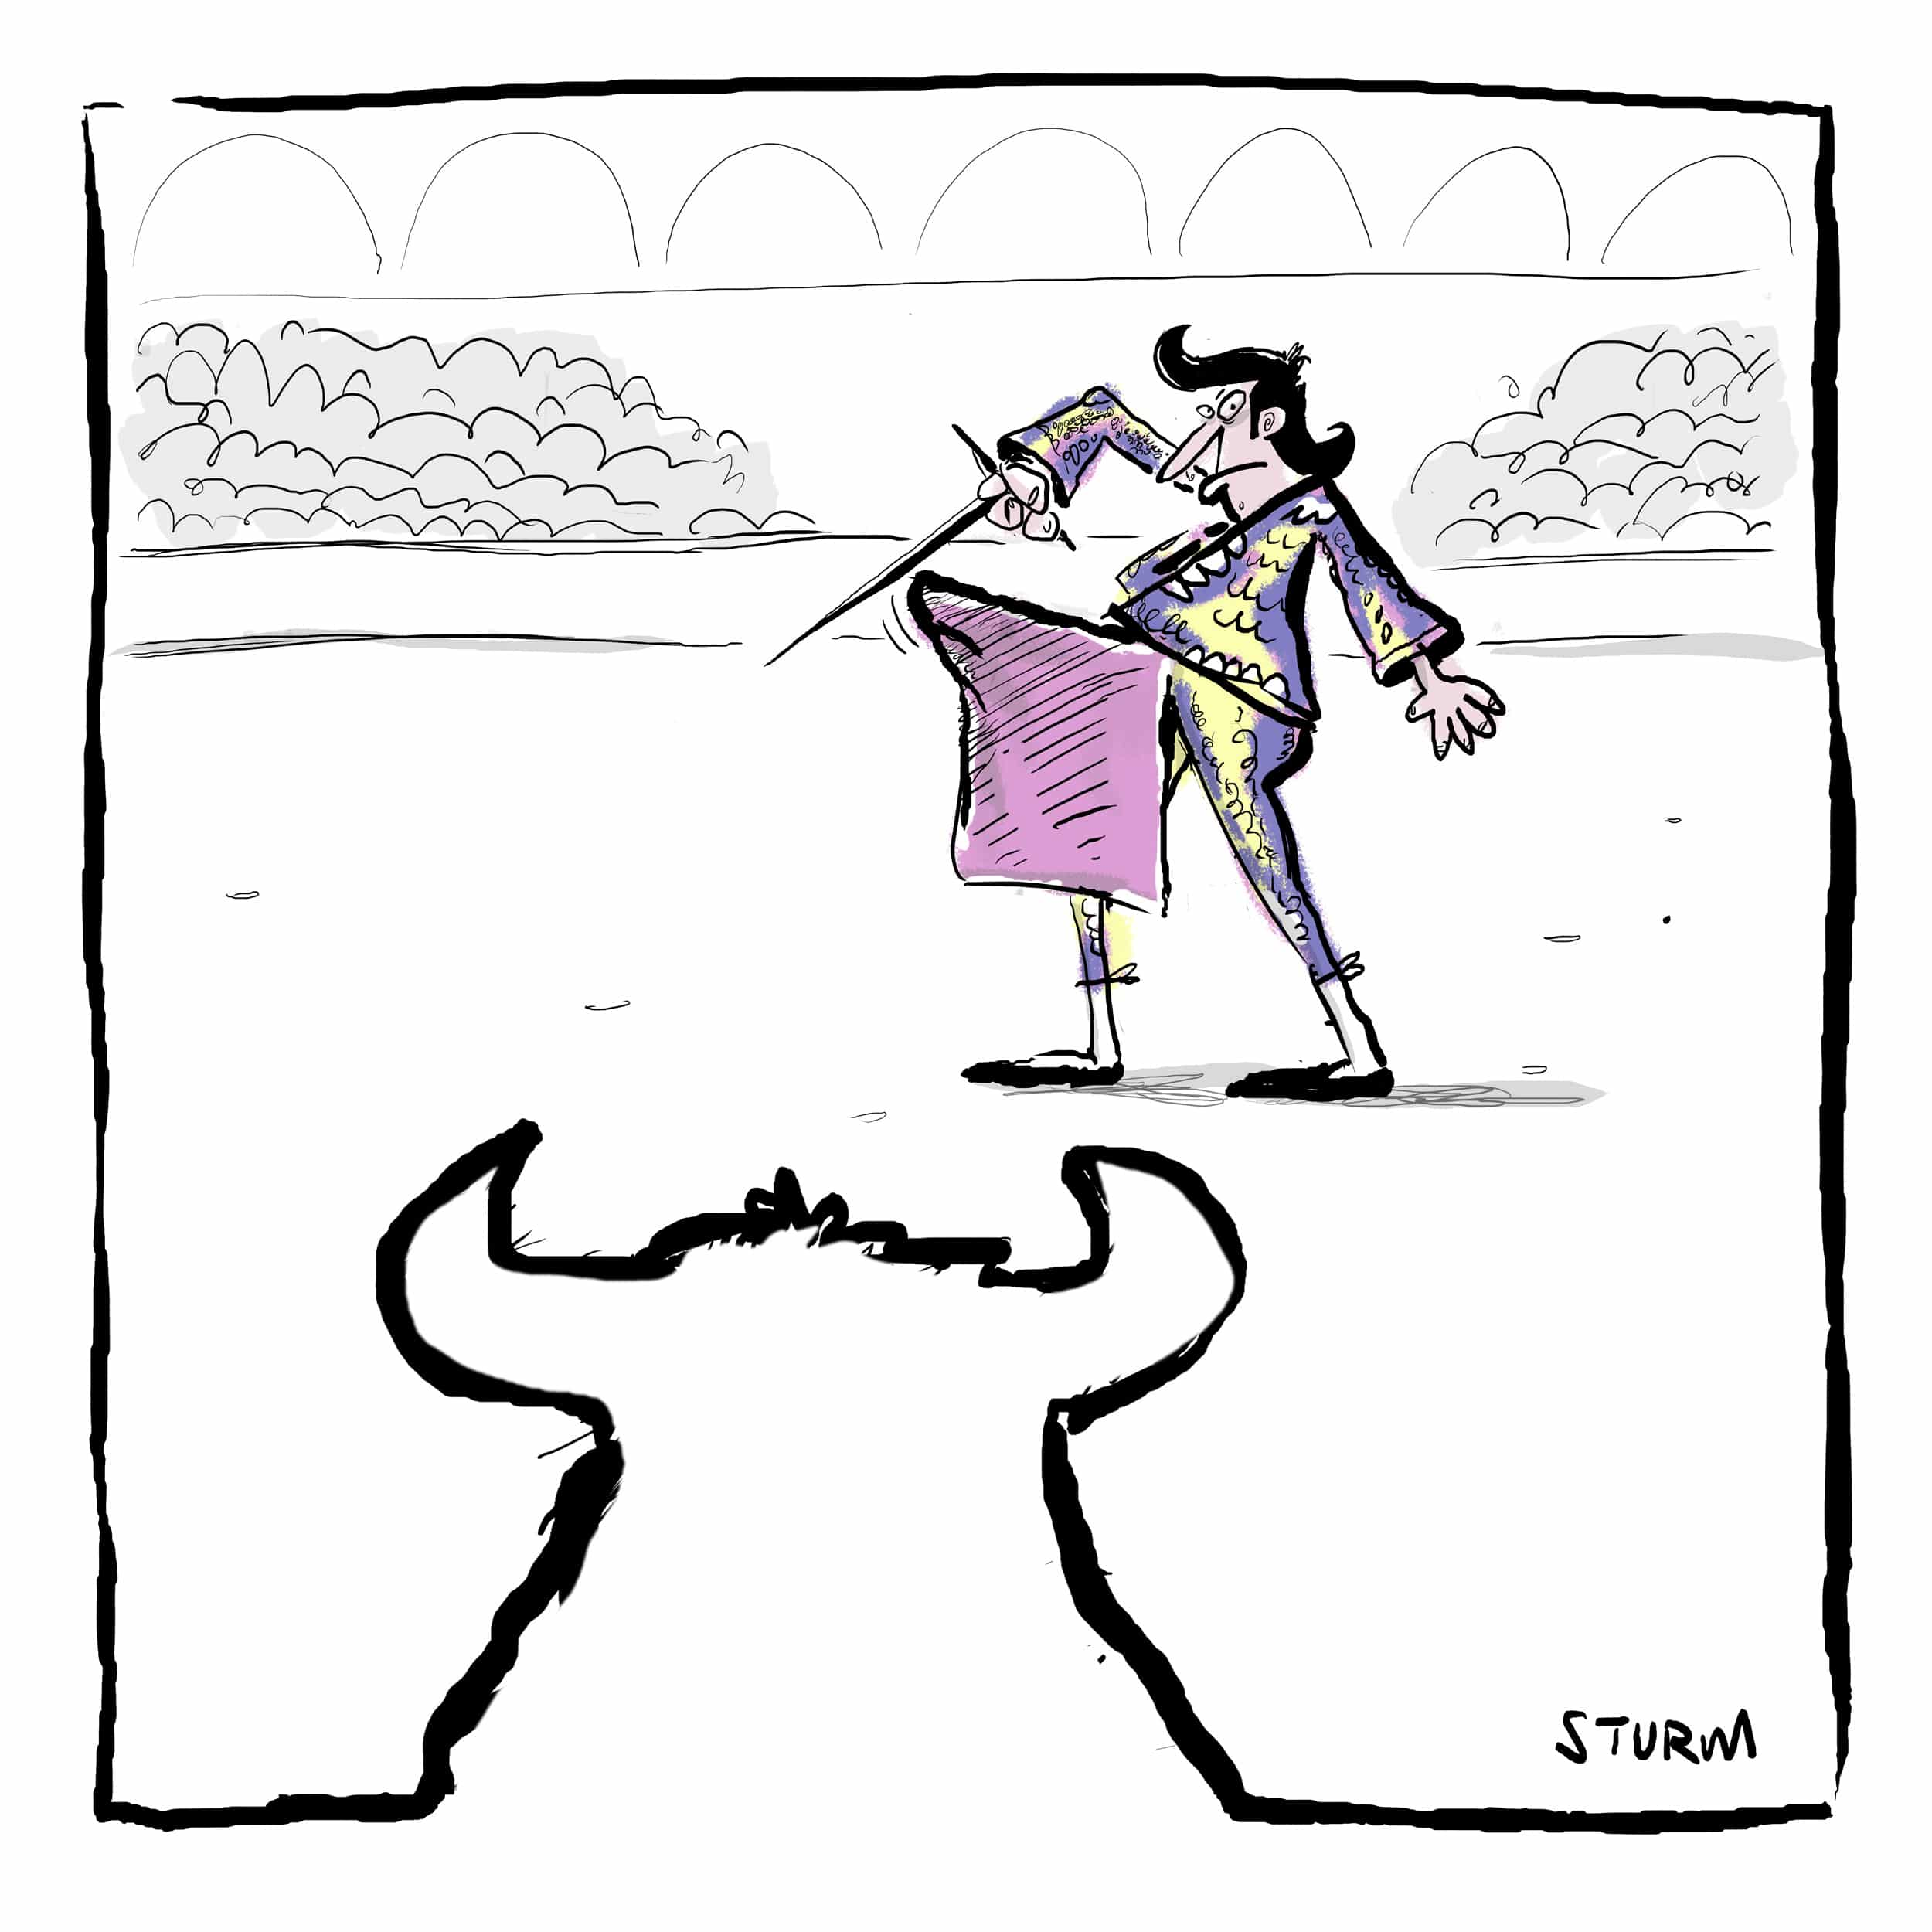 Matador - Cartoon Philipp Sturm